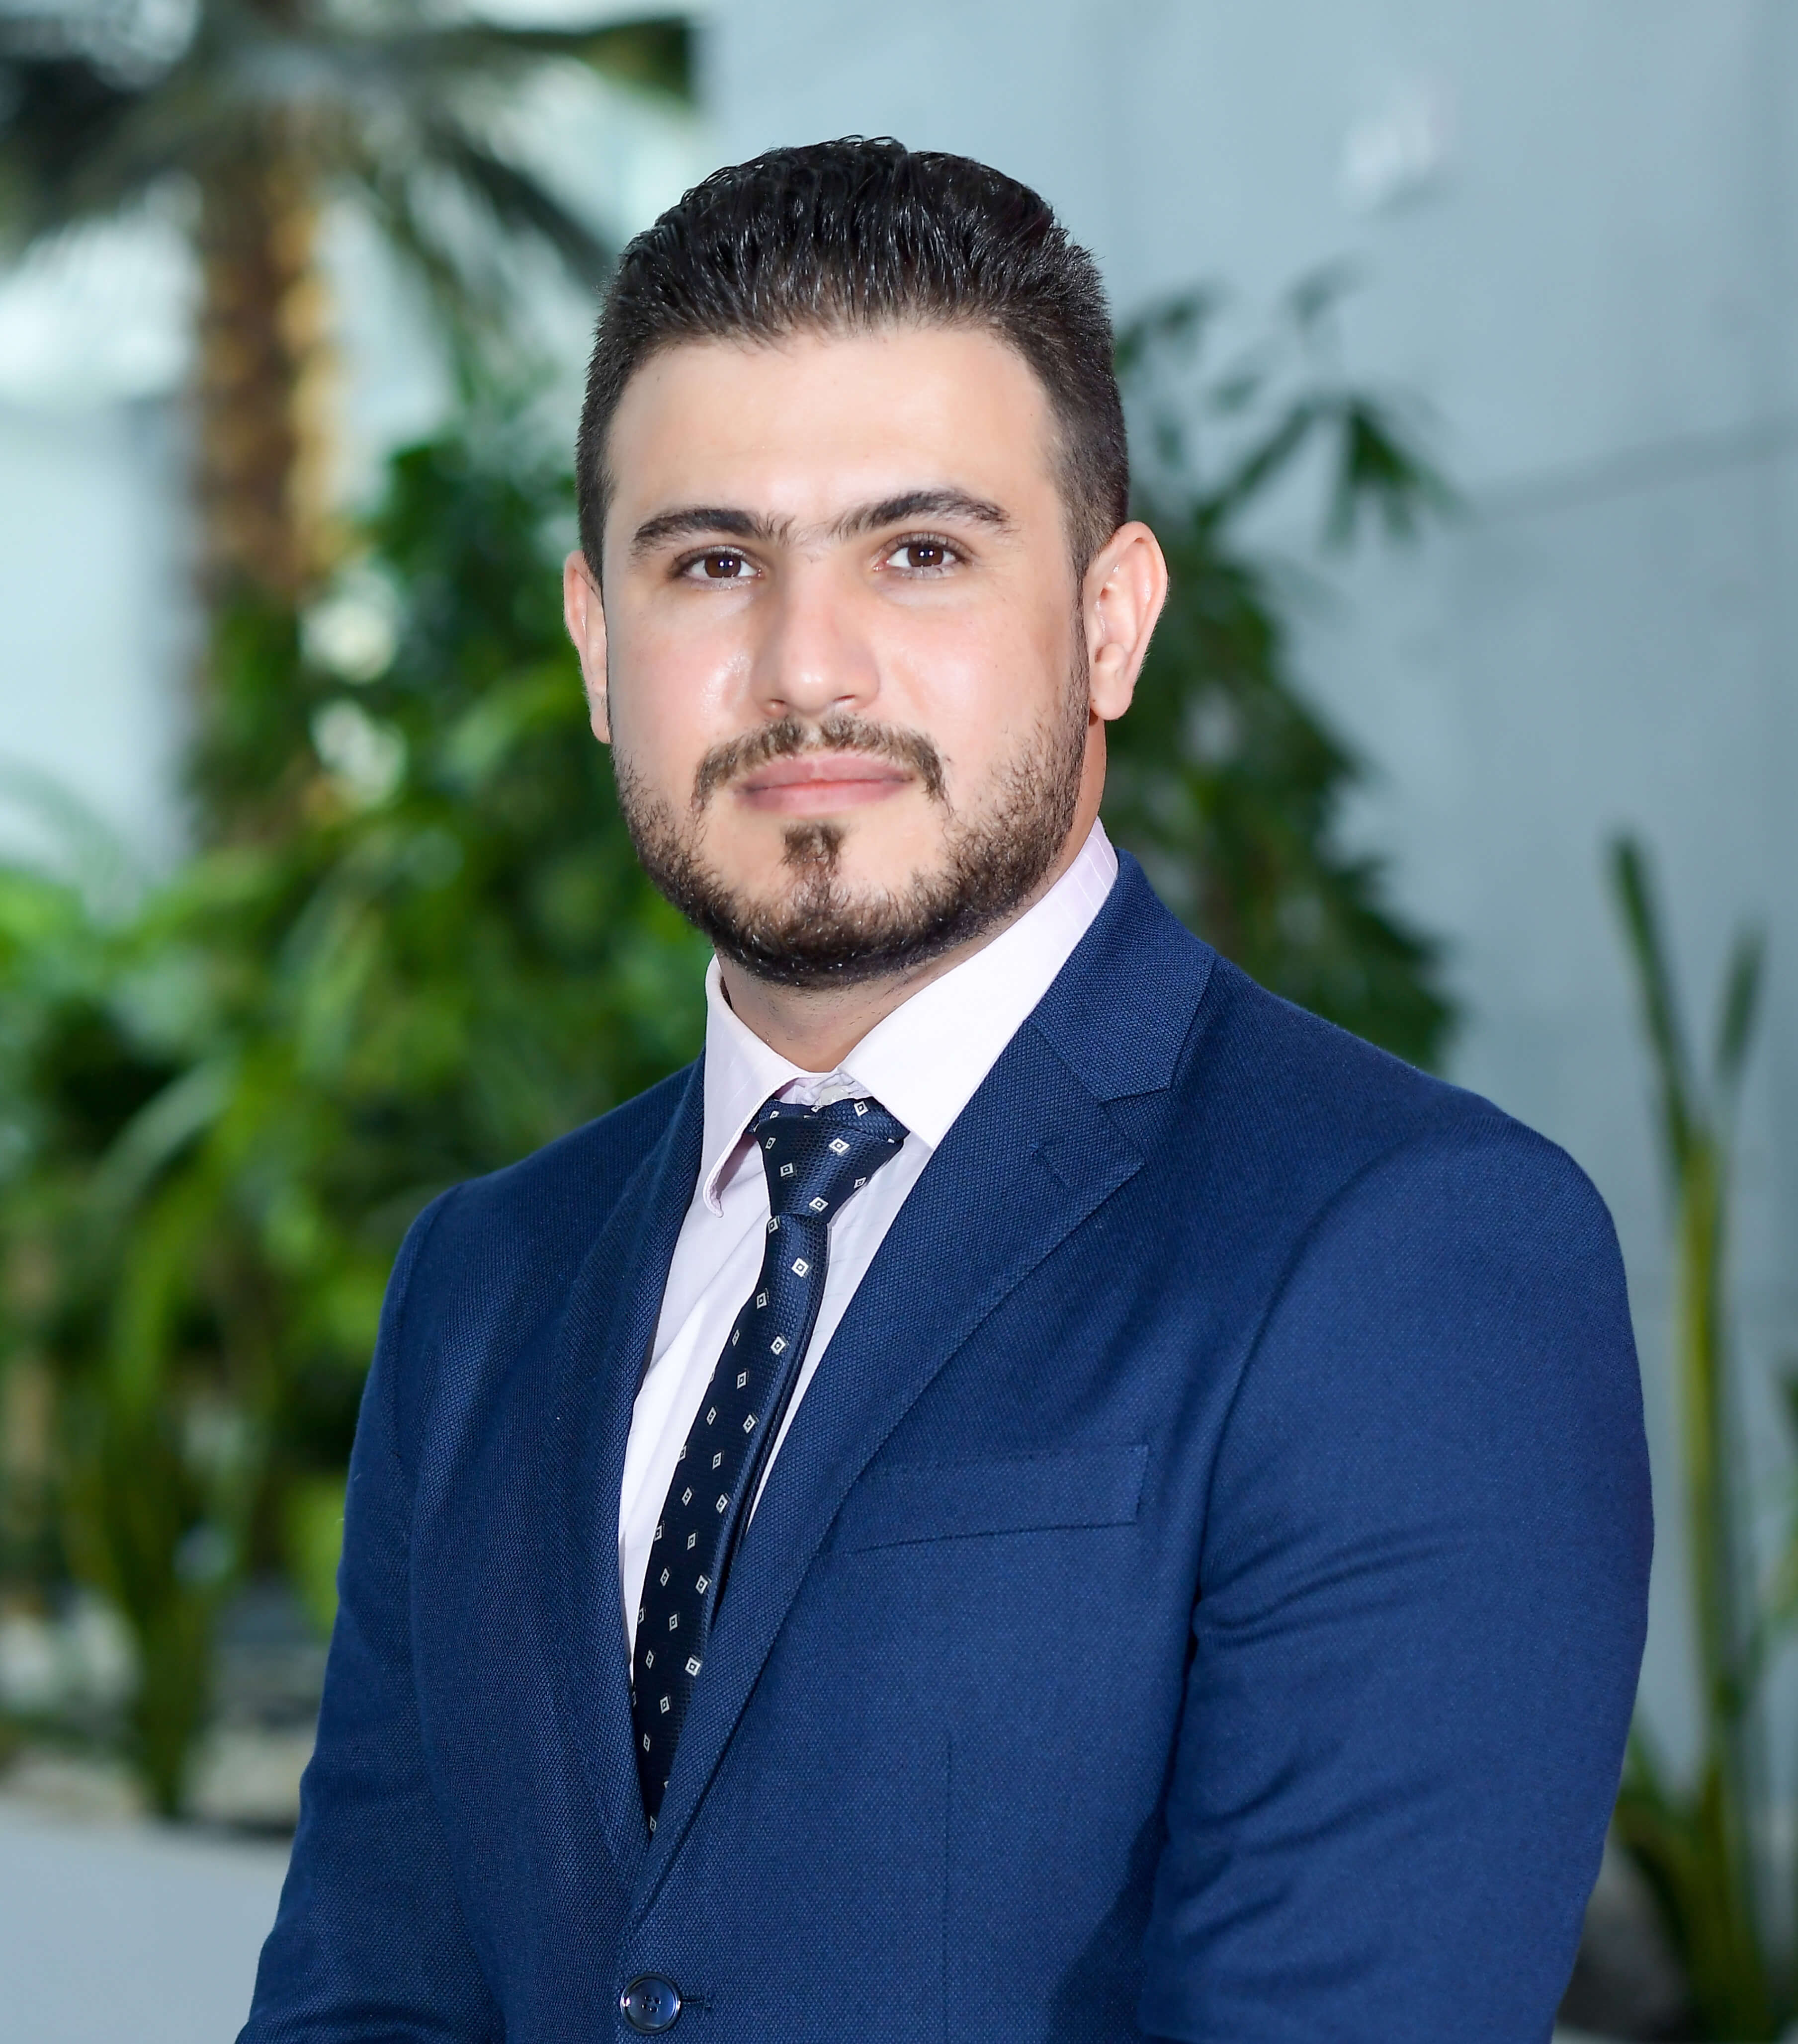 Dr. Abdul Raouf Tajik